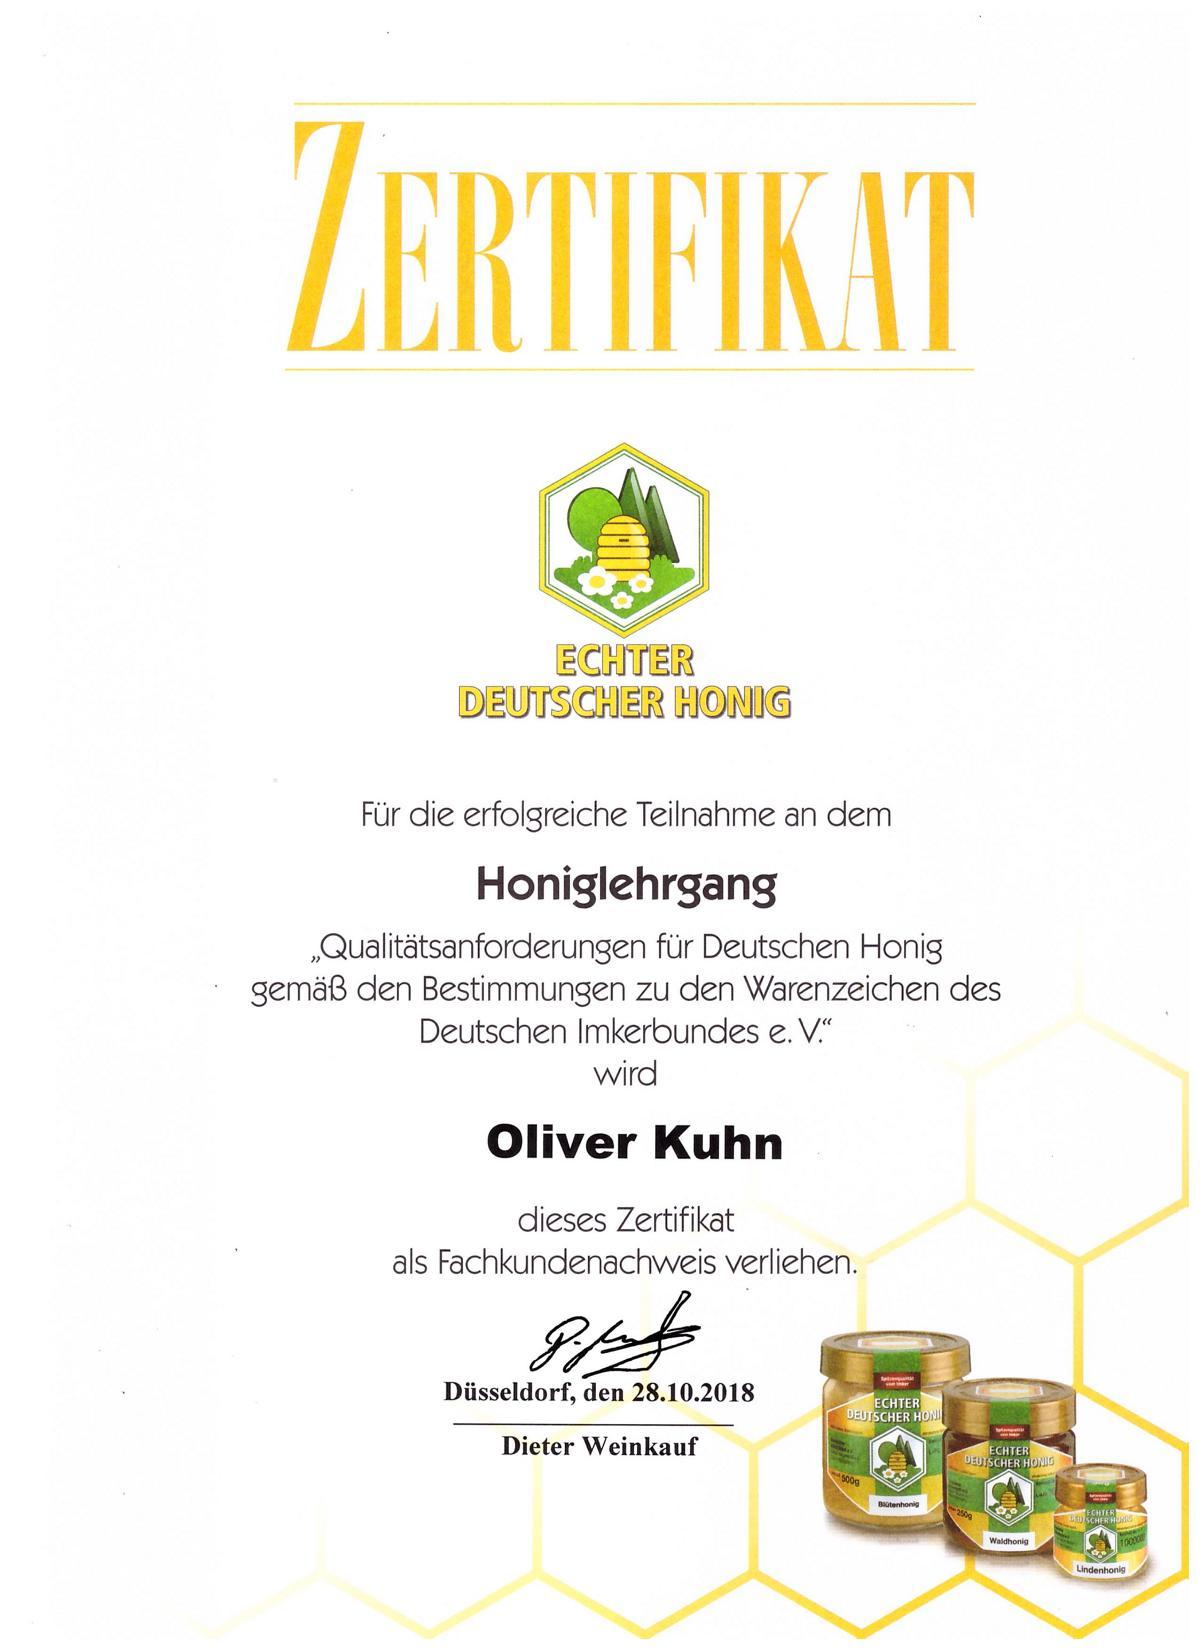 Honey Kuhn ist zertifizierter Honigproduzent aus Moerfelden Walldorf